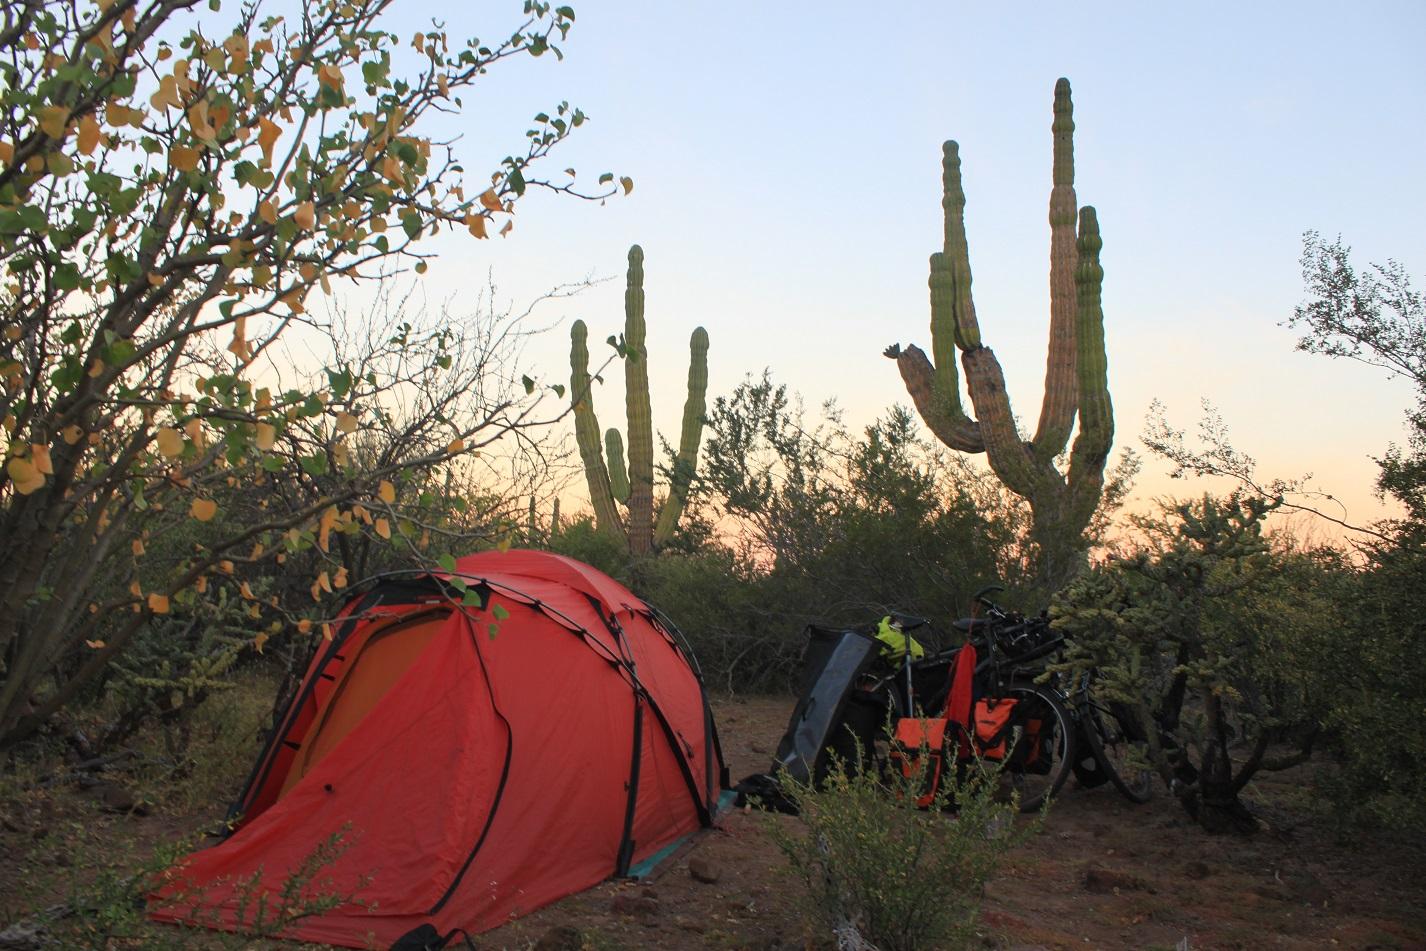 Zeltplatz in der Kaktuslandschaft